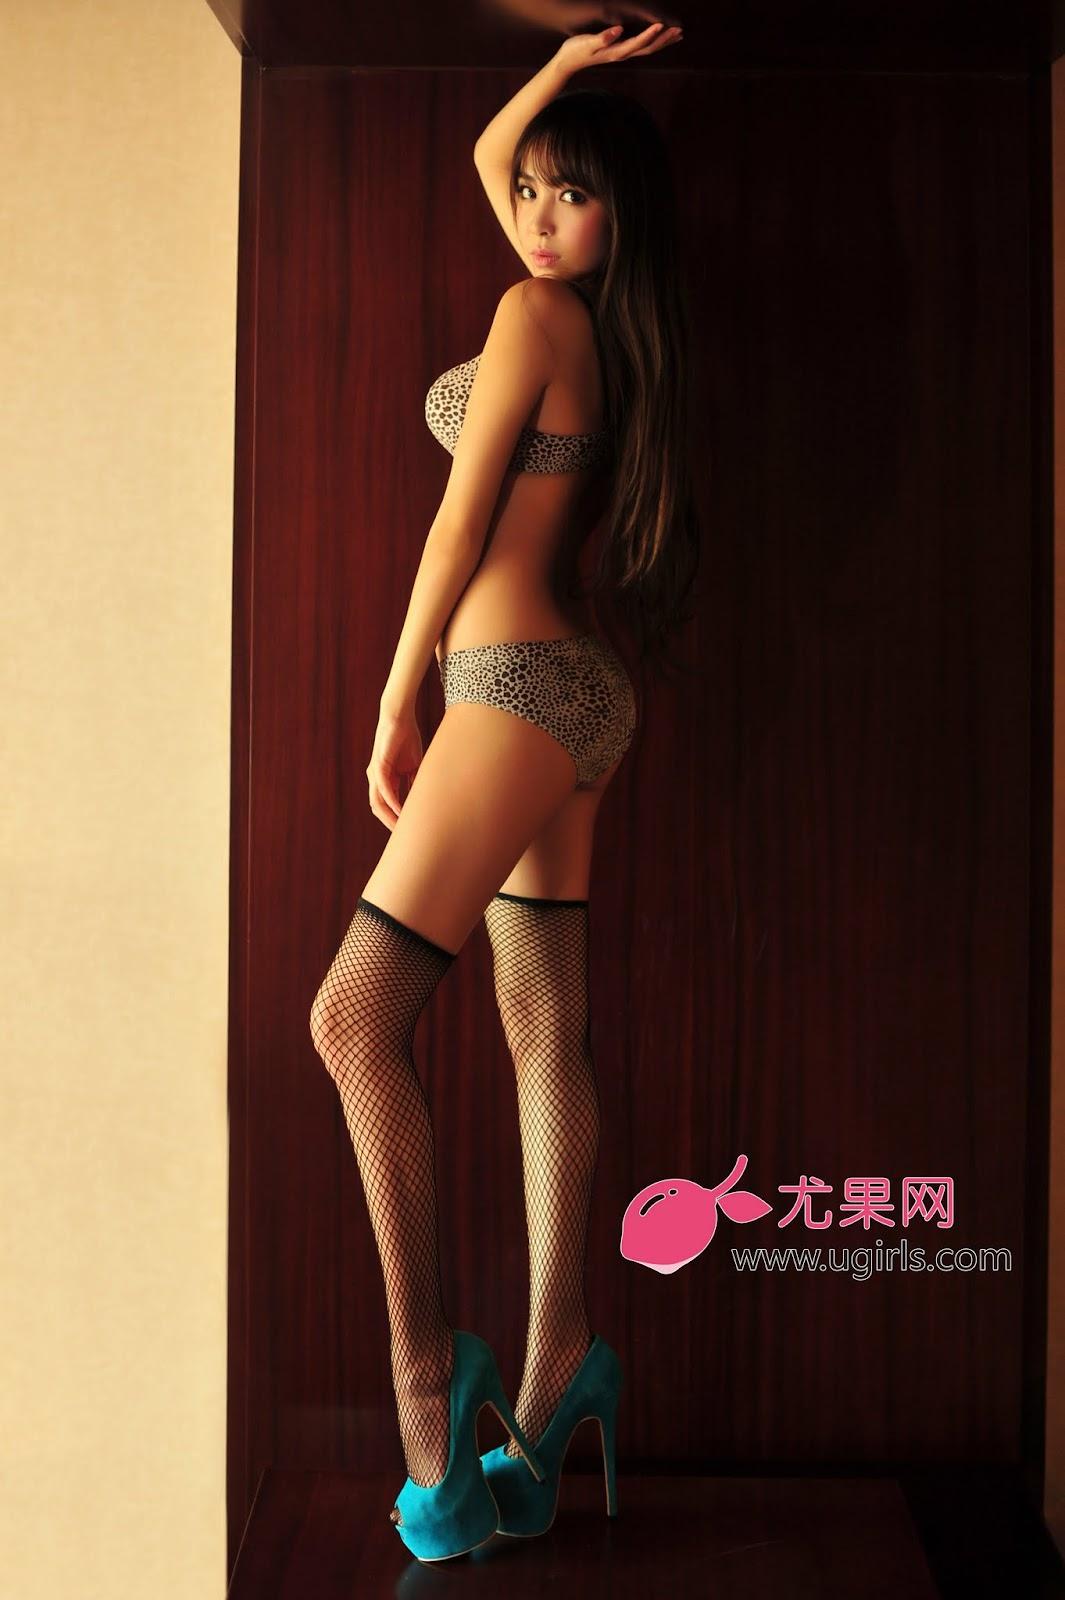 DLS 4717 - Hot Girl Model UGIRLS NO.13